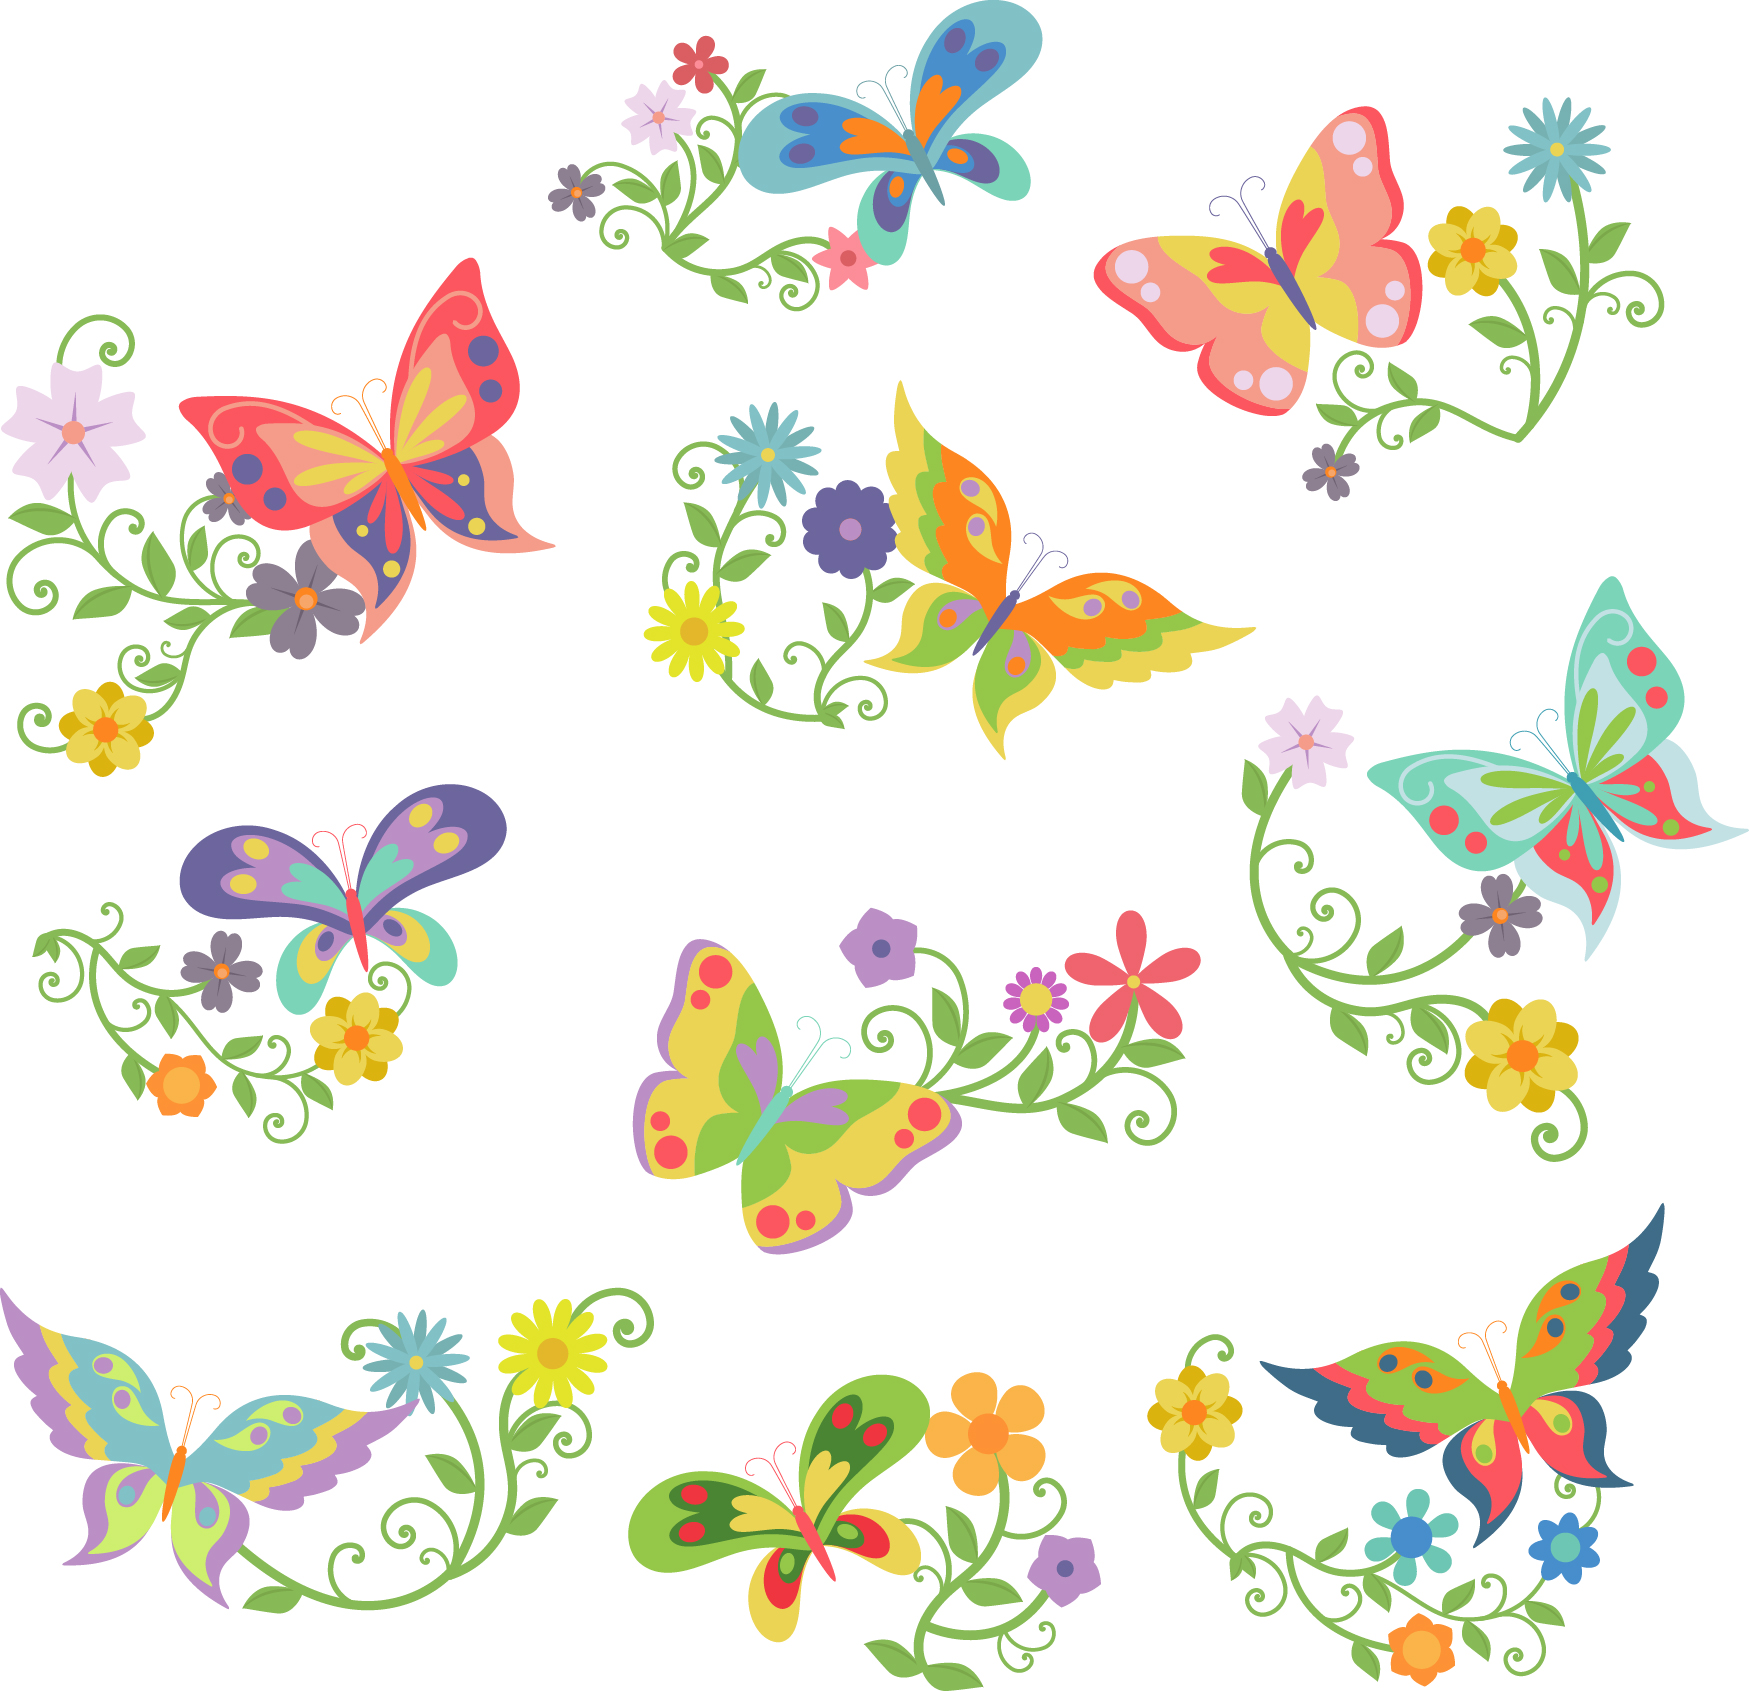 Clipart butterflies and flowers banner transparent Butterflies and Flowers Semi Exclusive Clip Art Set For Digitizing ... banner transparent